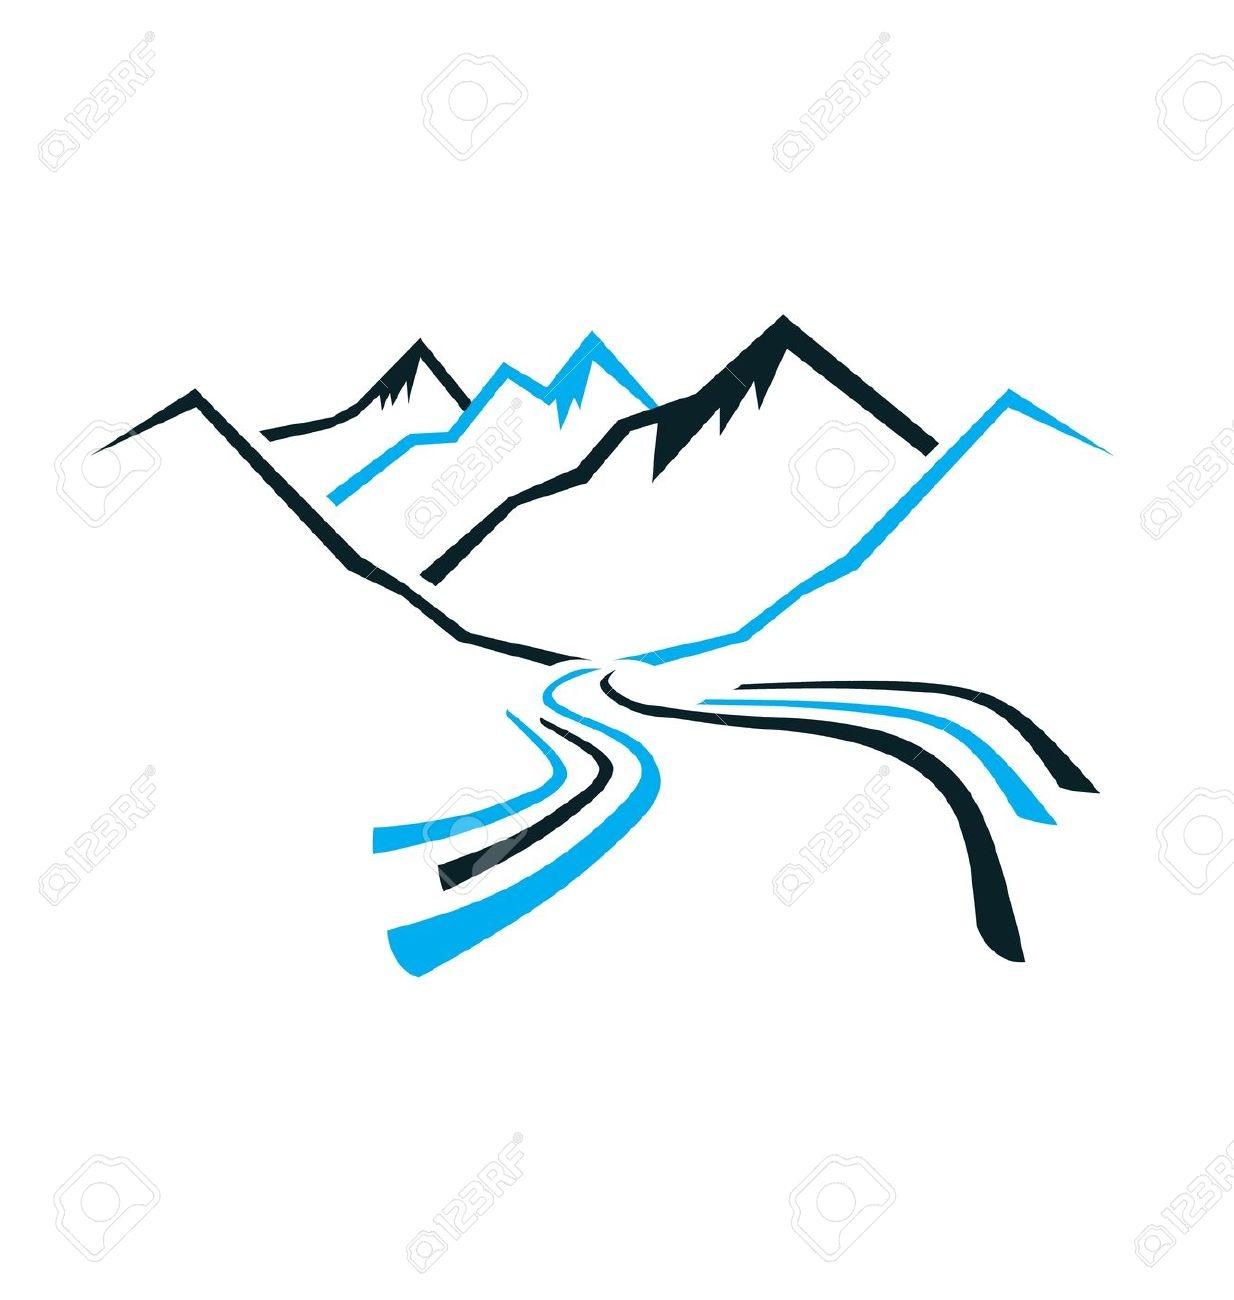 Mountain free eclip art. Clipart mountains river